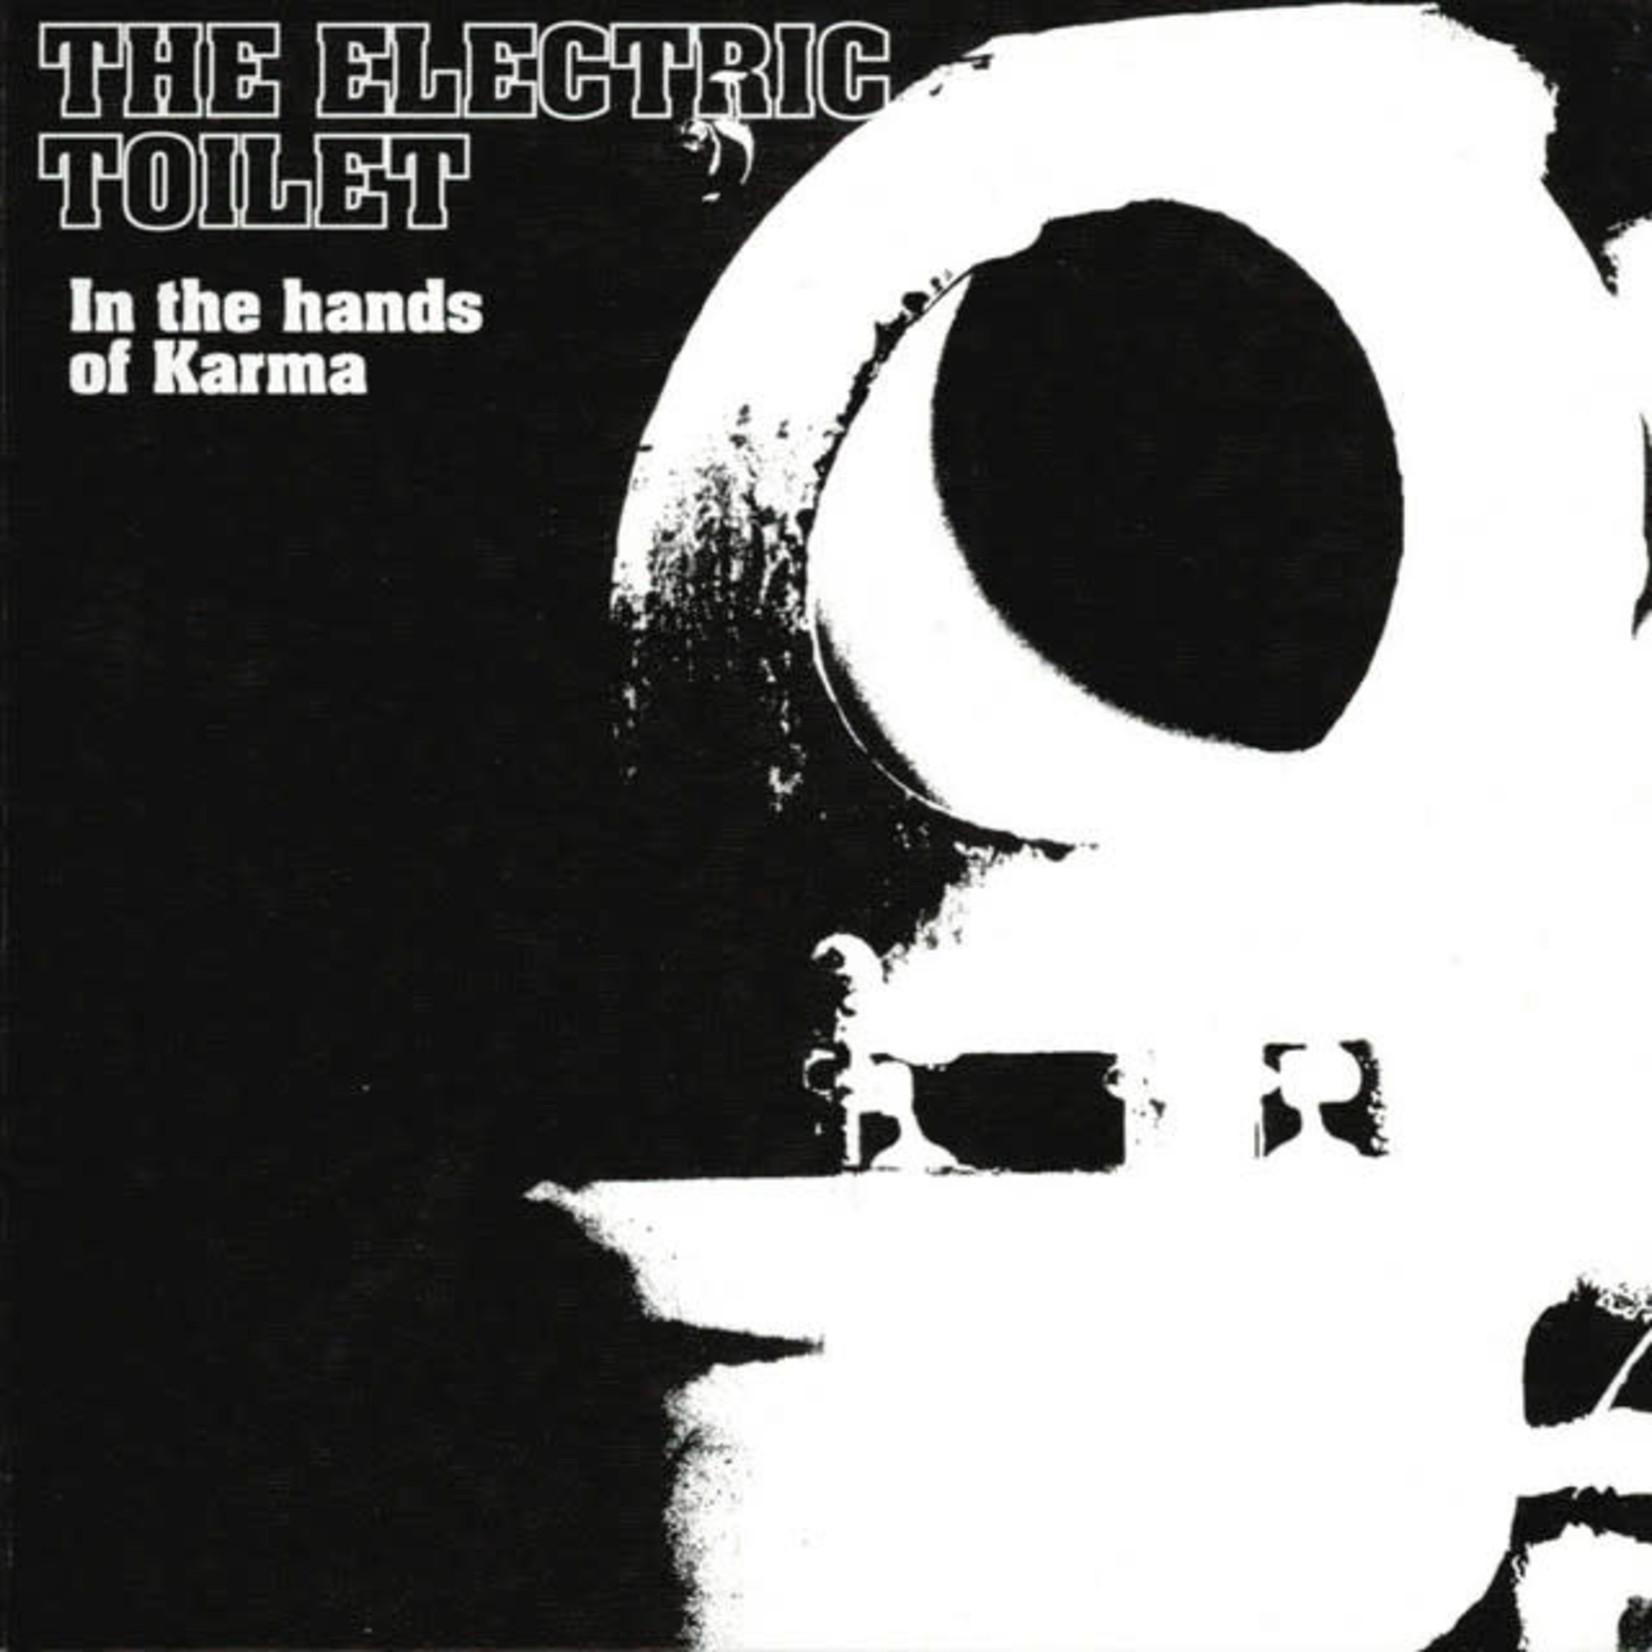 Vinyl Electric Toilet - In the hands of karma